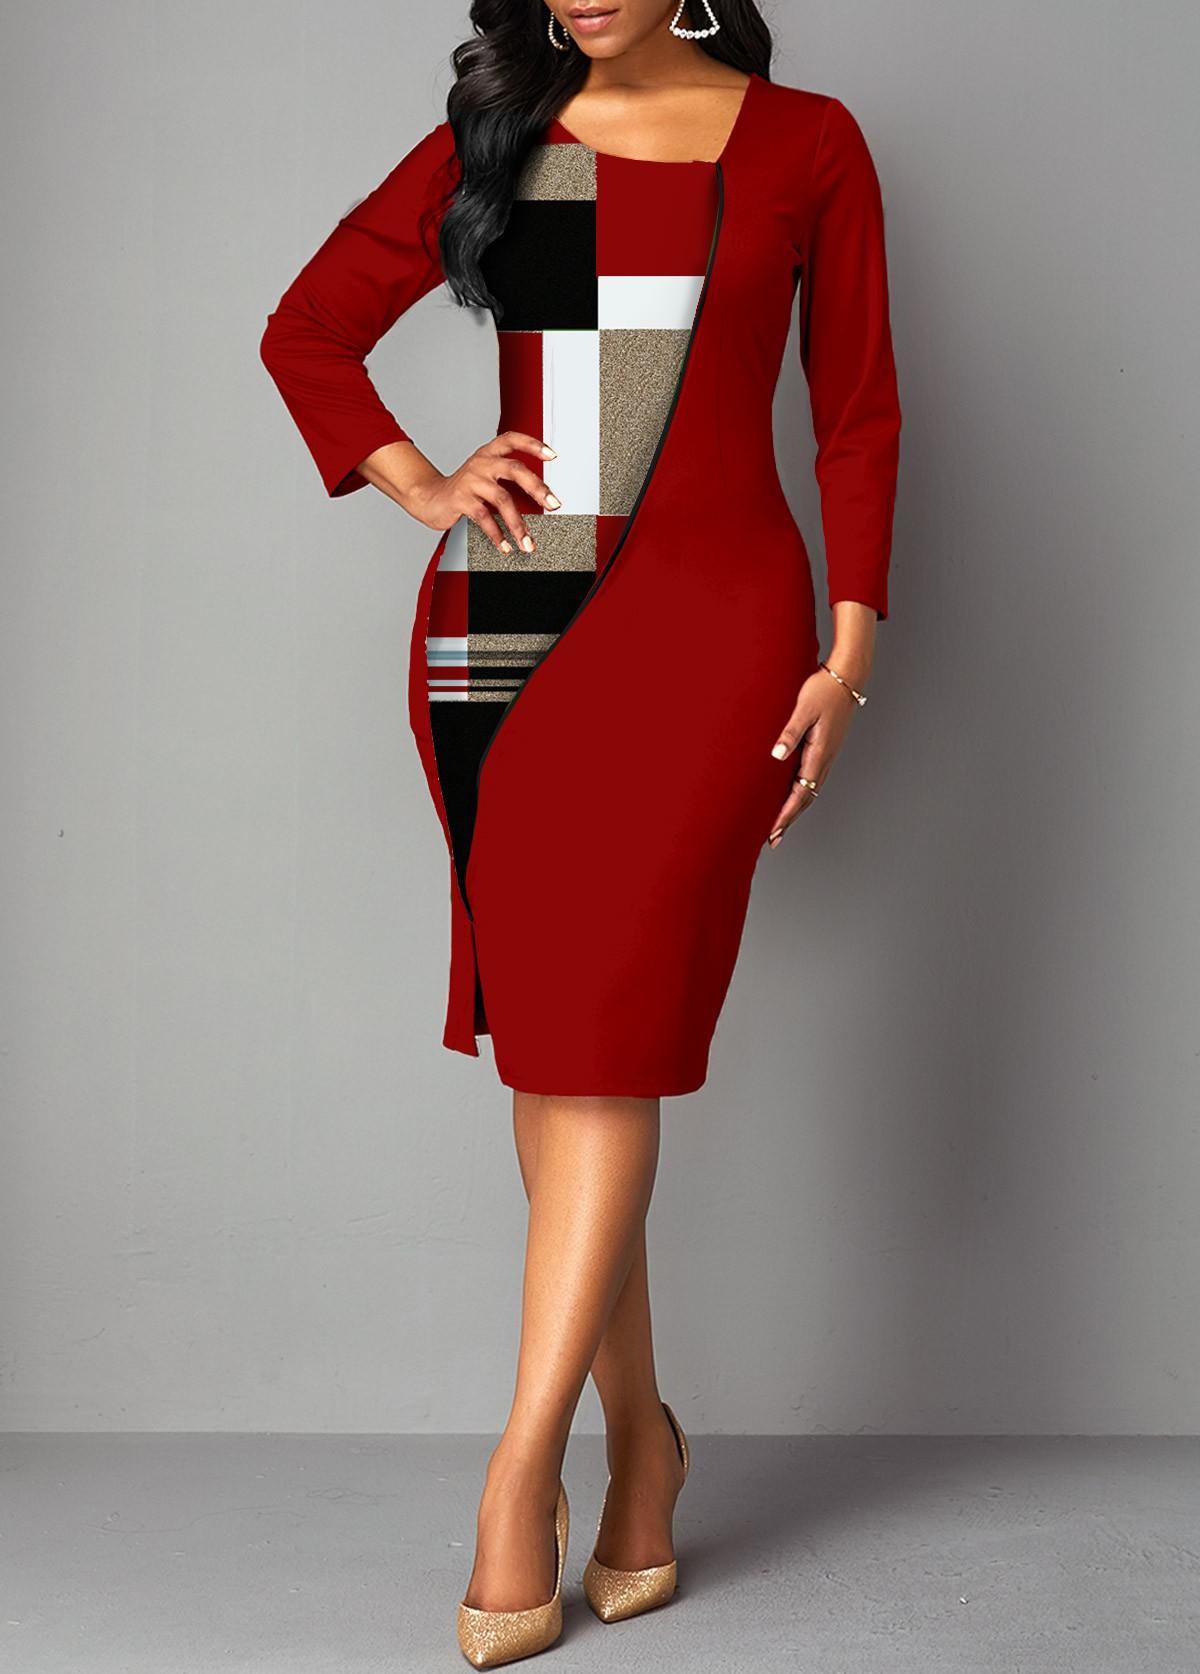 Plaid 3/4 Sleeve Side Slit Bodycon Dress